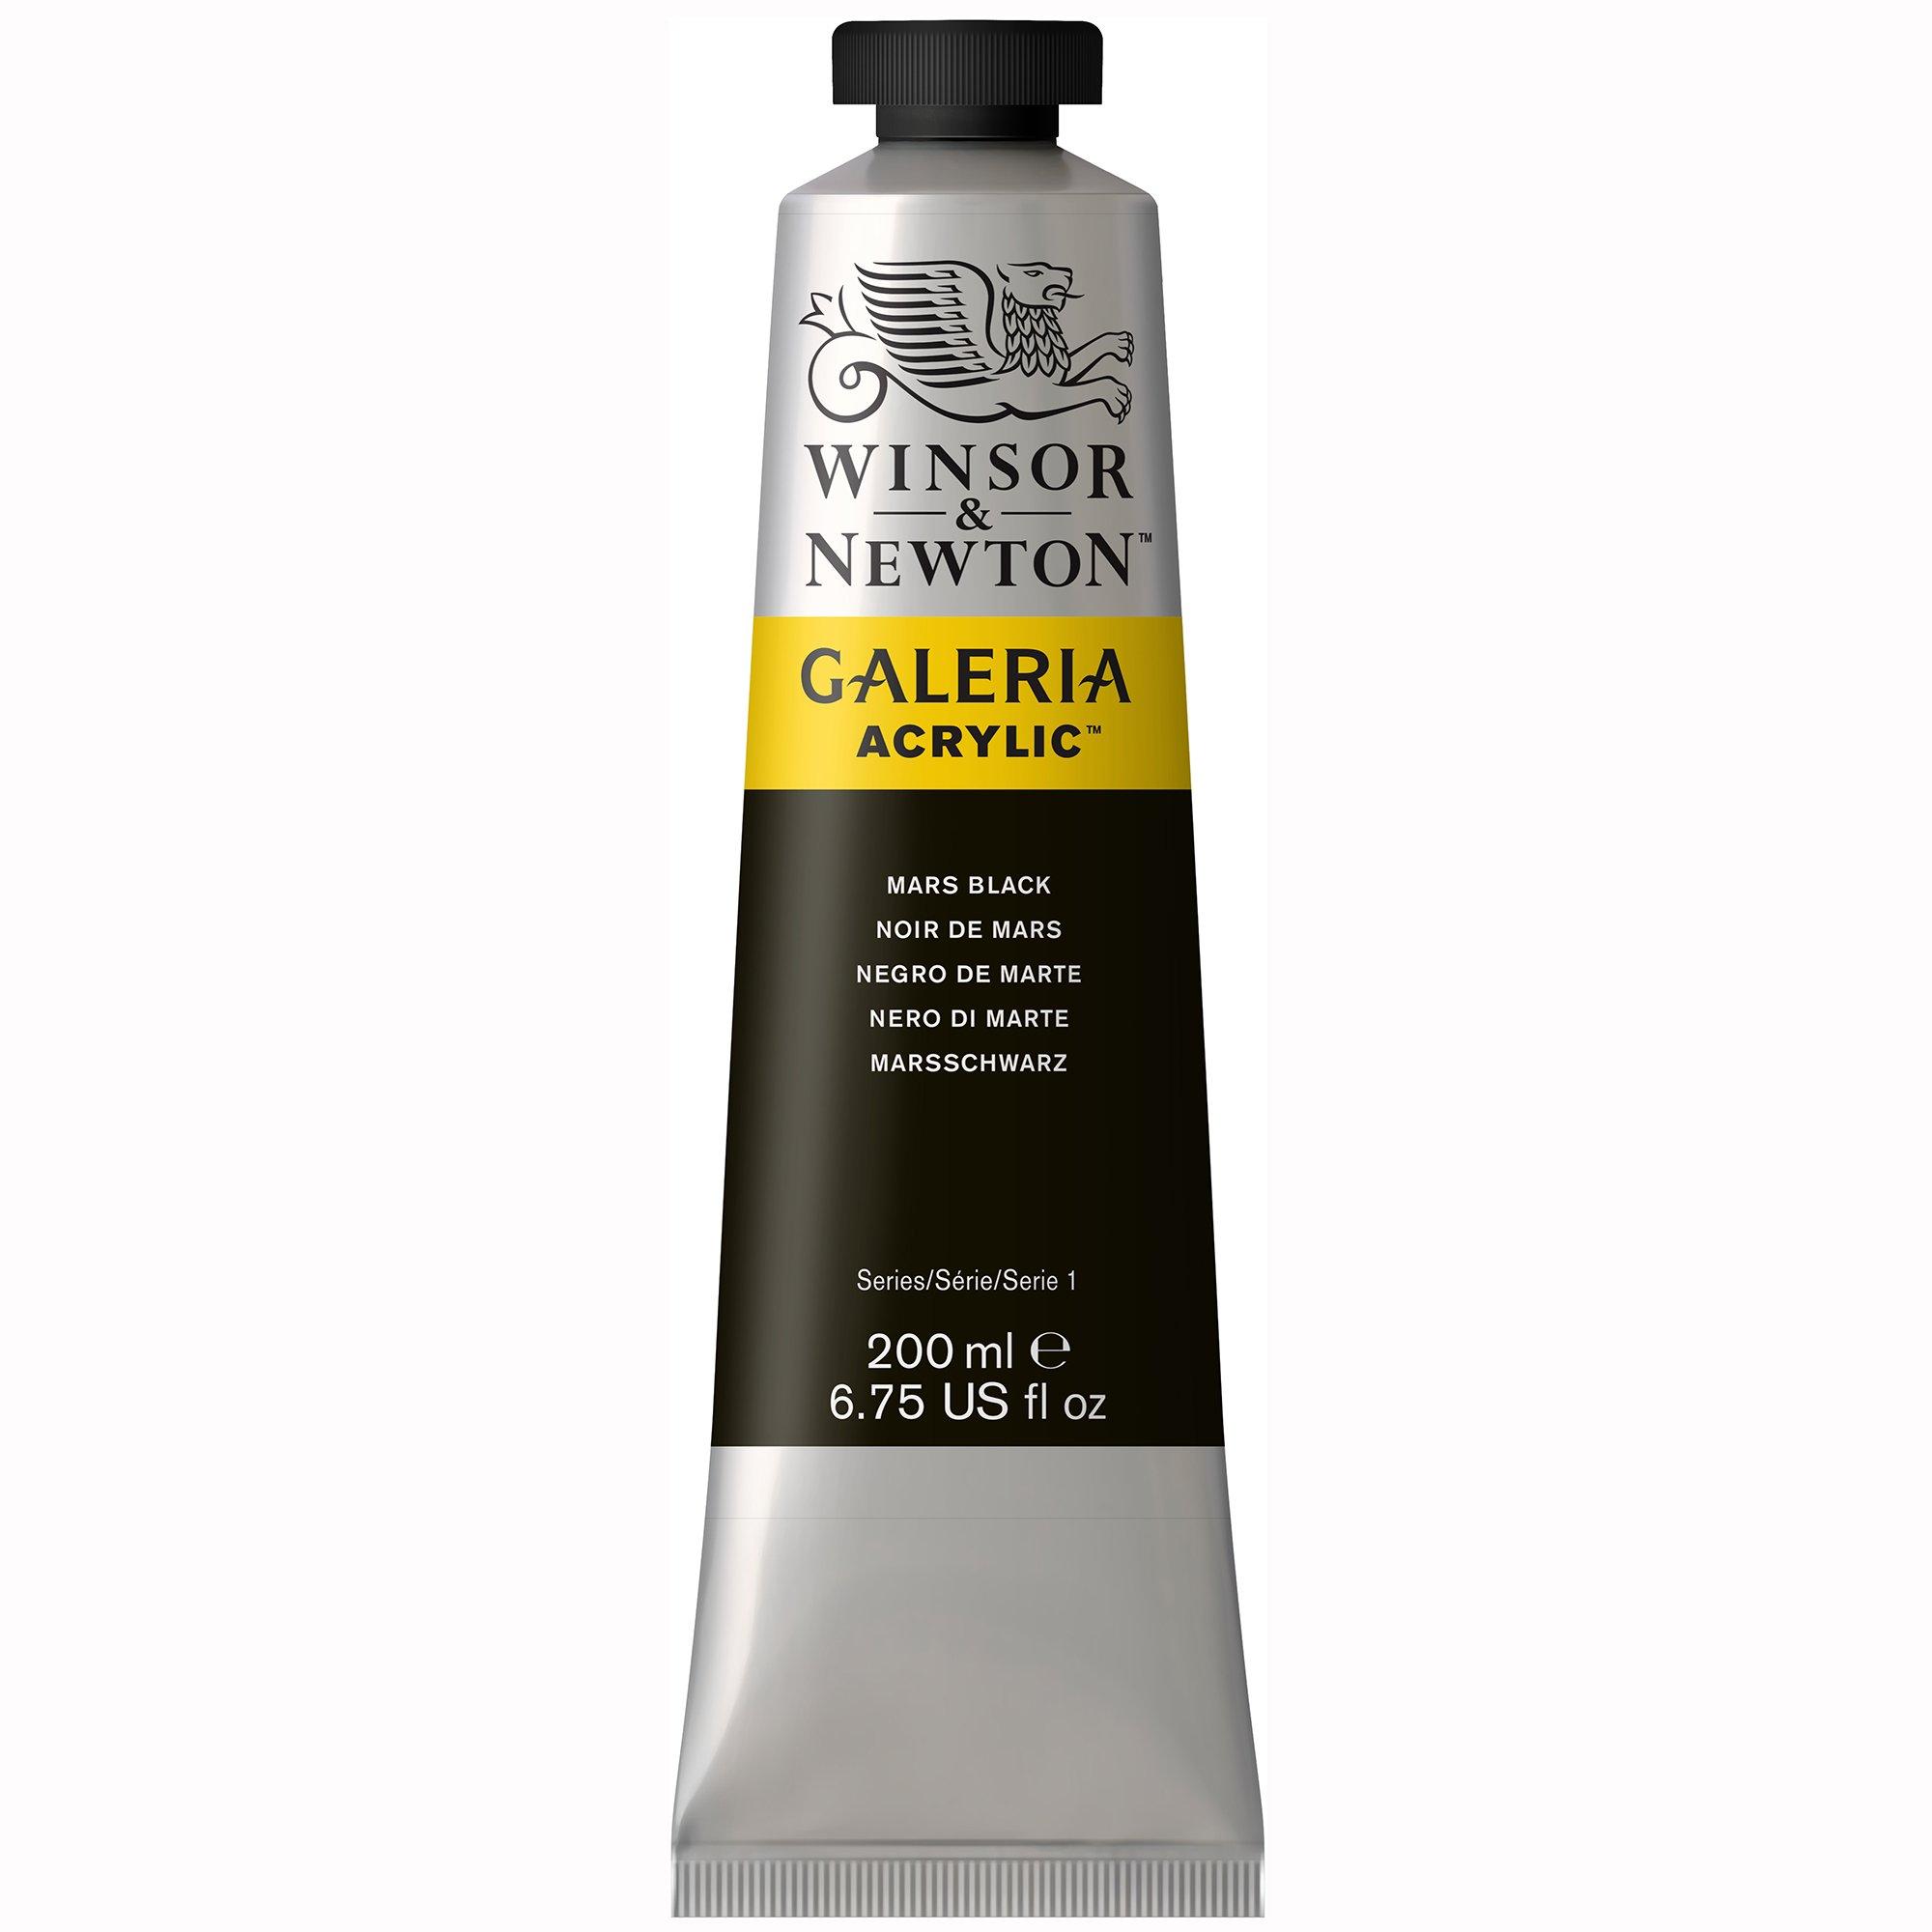 Winsor & Newton , Mars Black Galeria Acrylic Paint, 200ml Tube, 200-ml